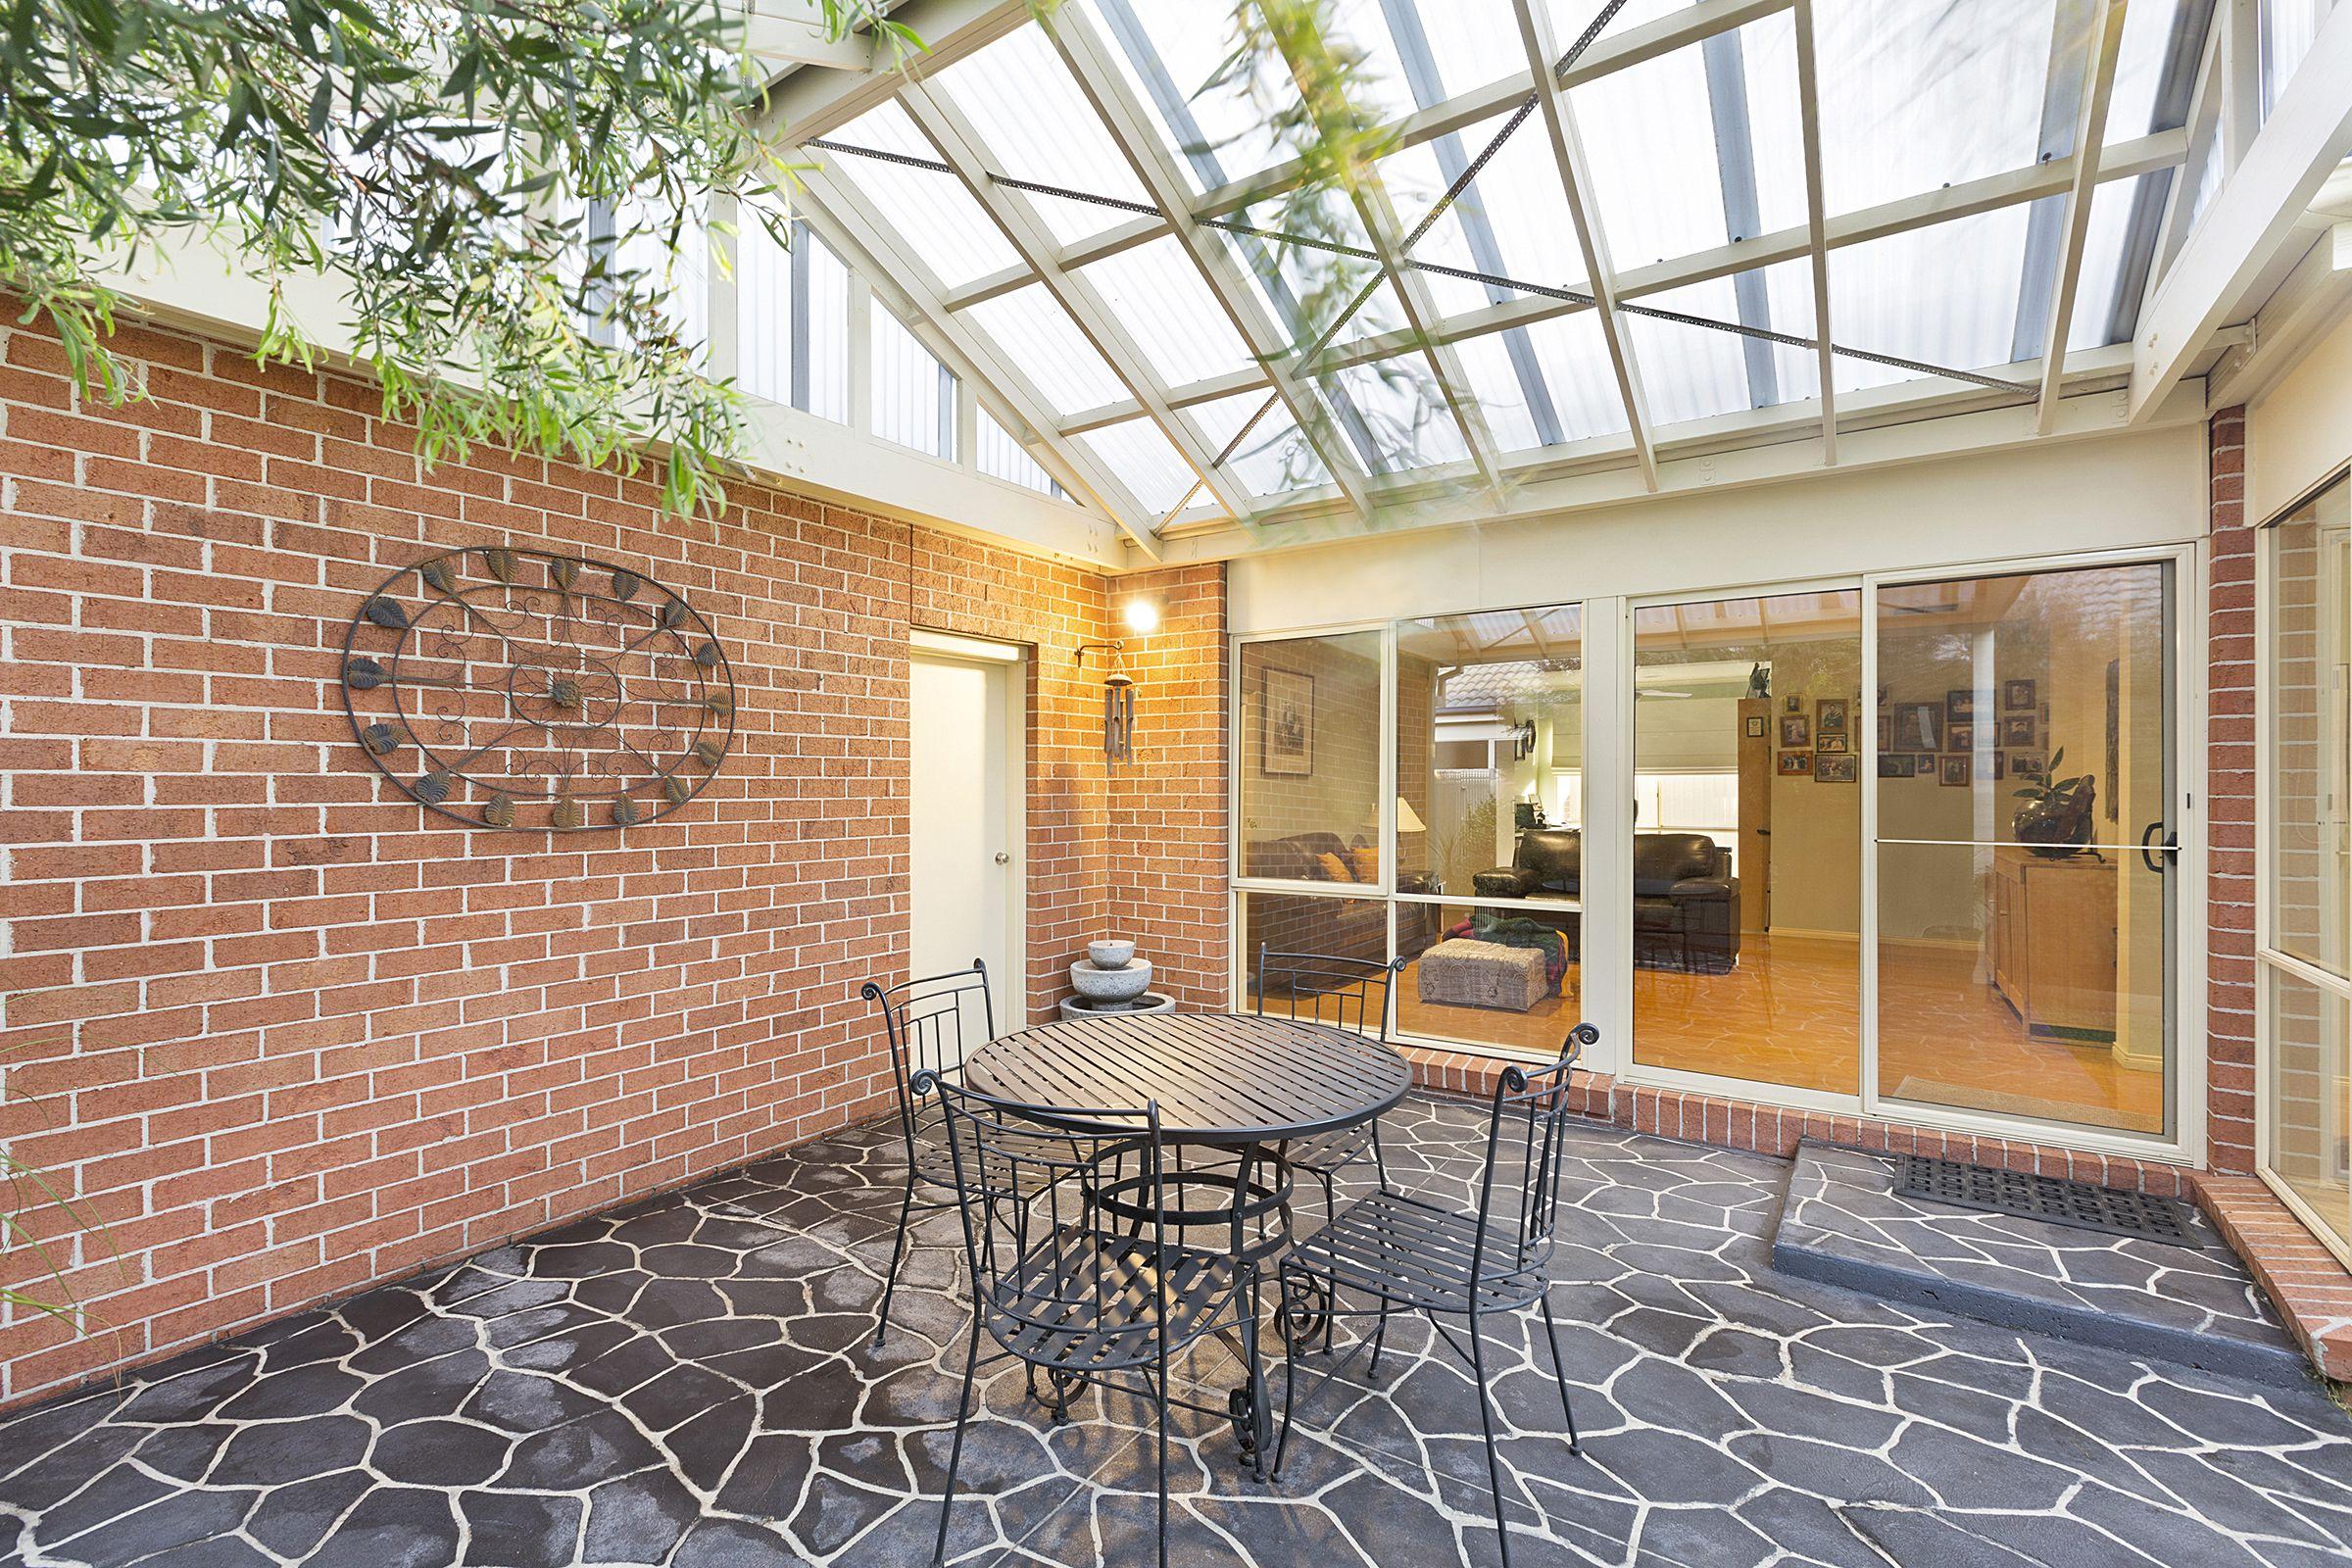 Verandah extensions/renovations Geelong, Victoria AUS ...